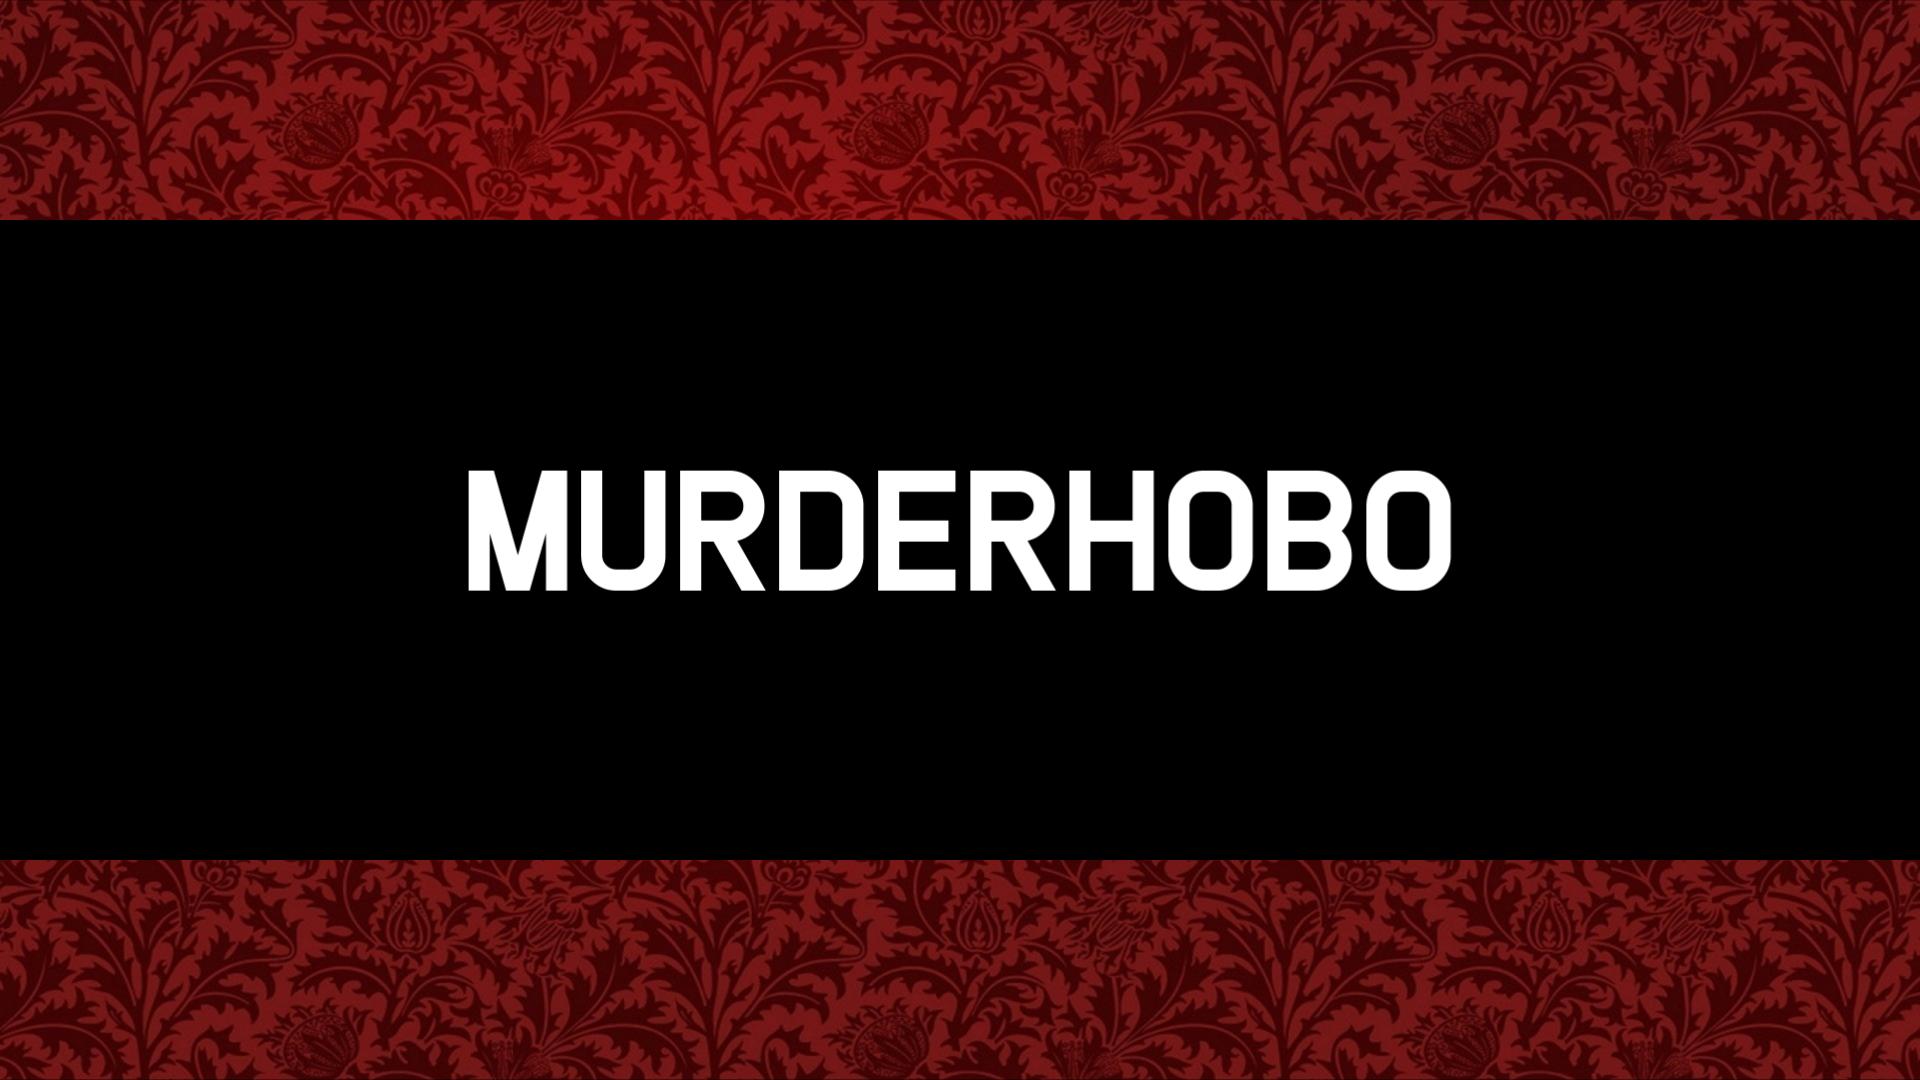 Murderhobo.png.4ce3e4997a1fc71f165635b4cd412bc7.png